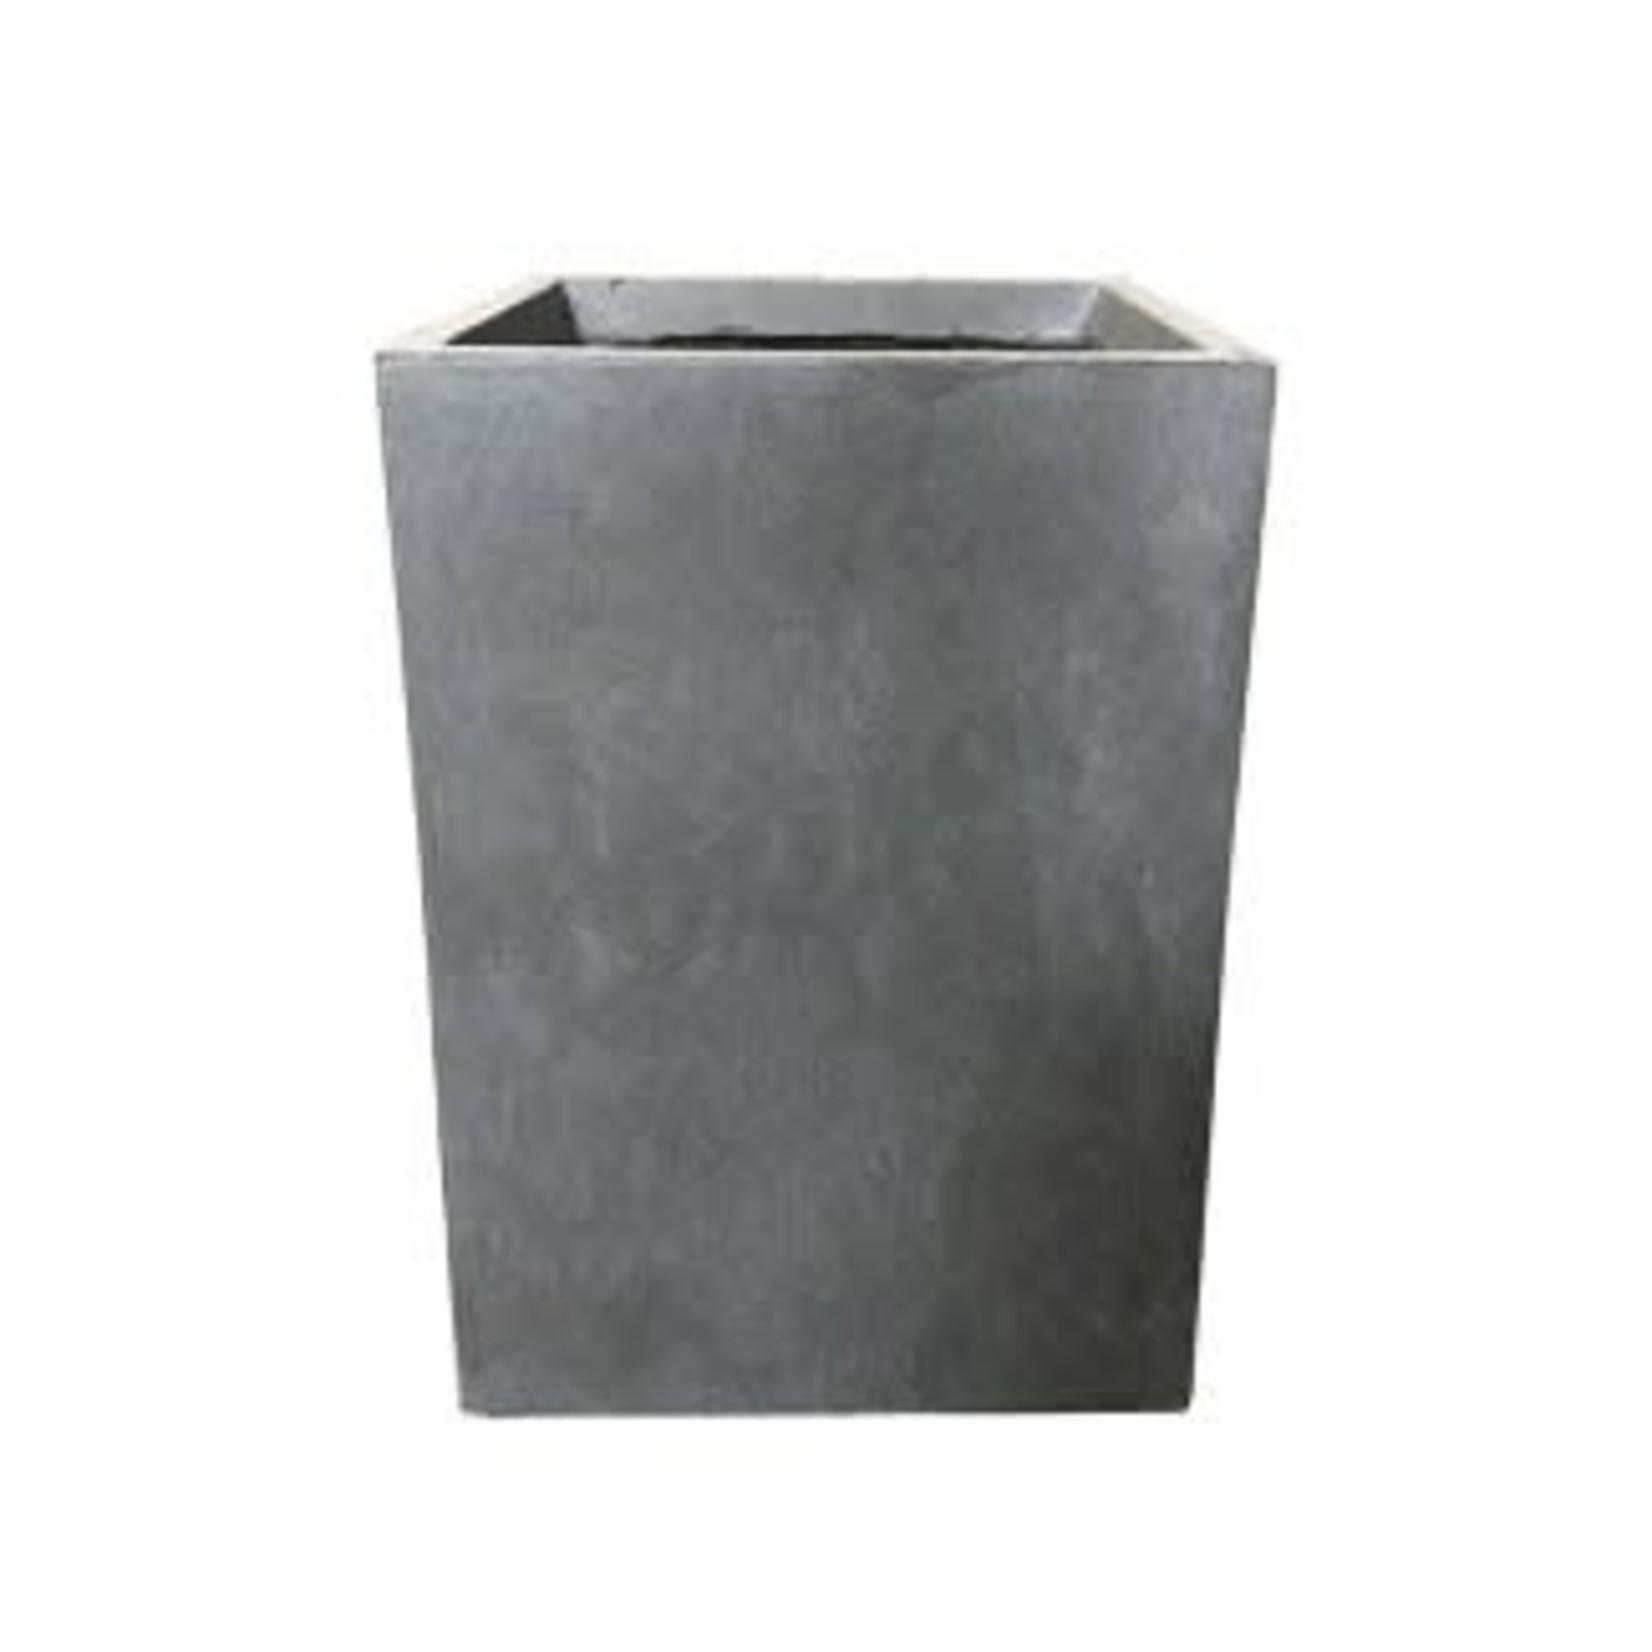 Kante Lightweight Tall Outdoor Square Concrete Planter Slate Gray